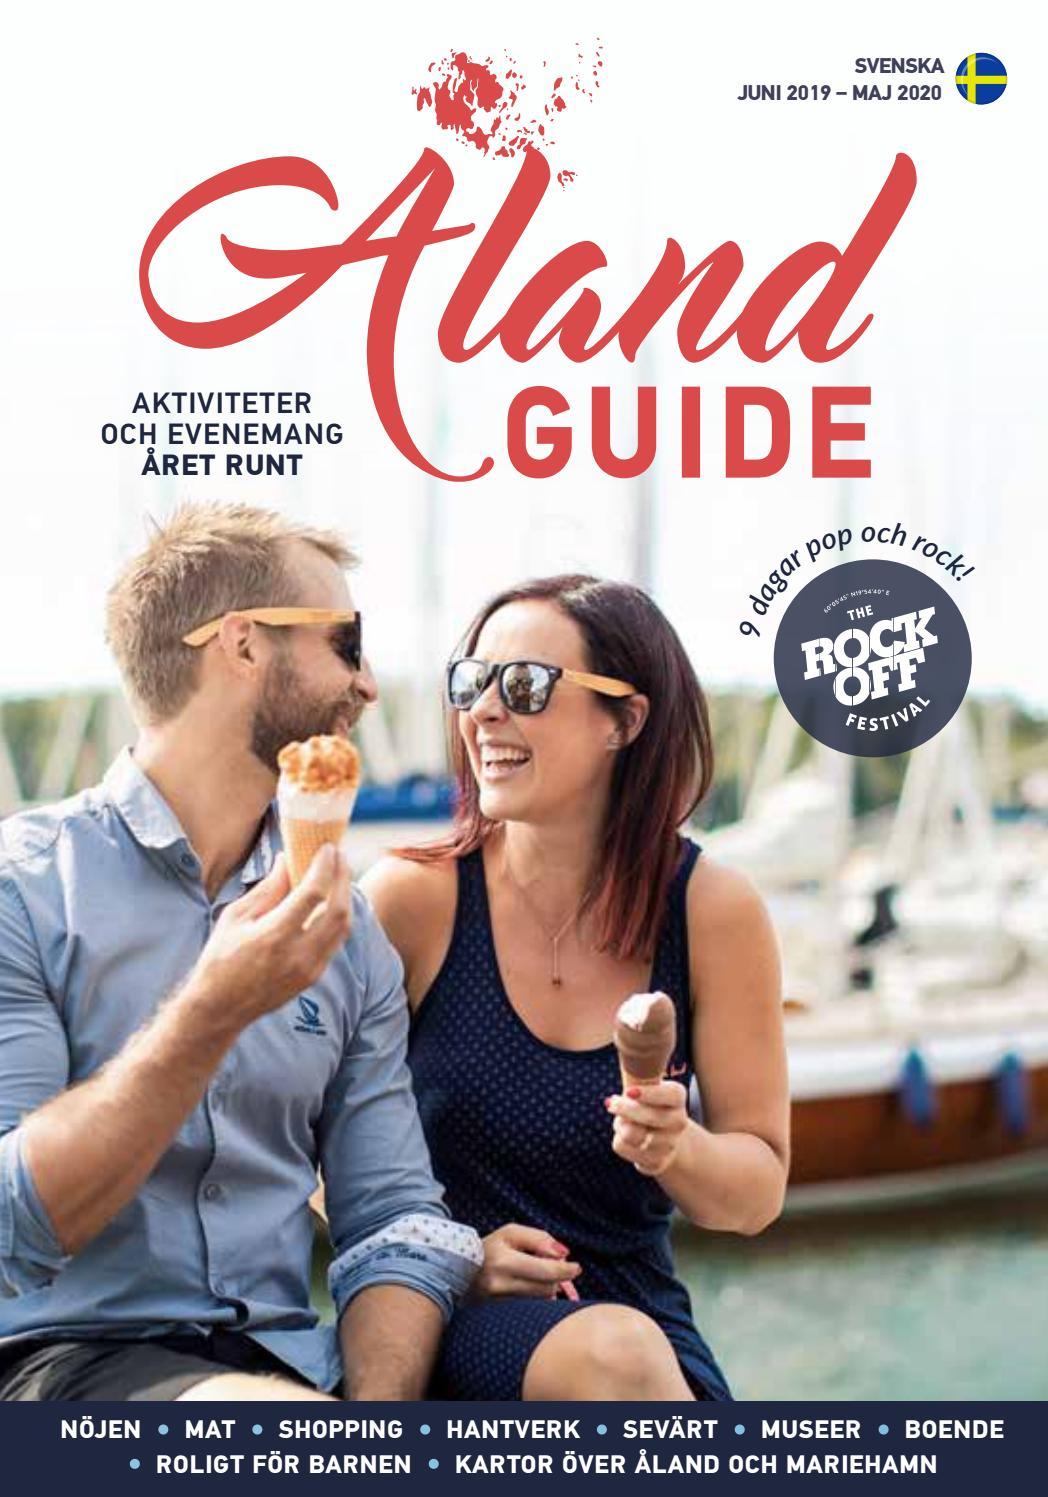 e7029bb63f95 Åland Guide 2019 Svenska by Strax Kommunikation - issuu